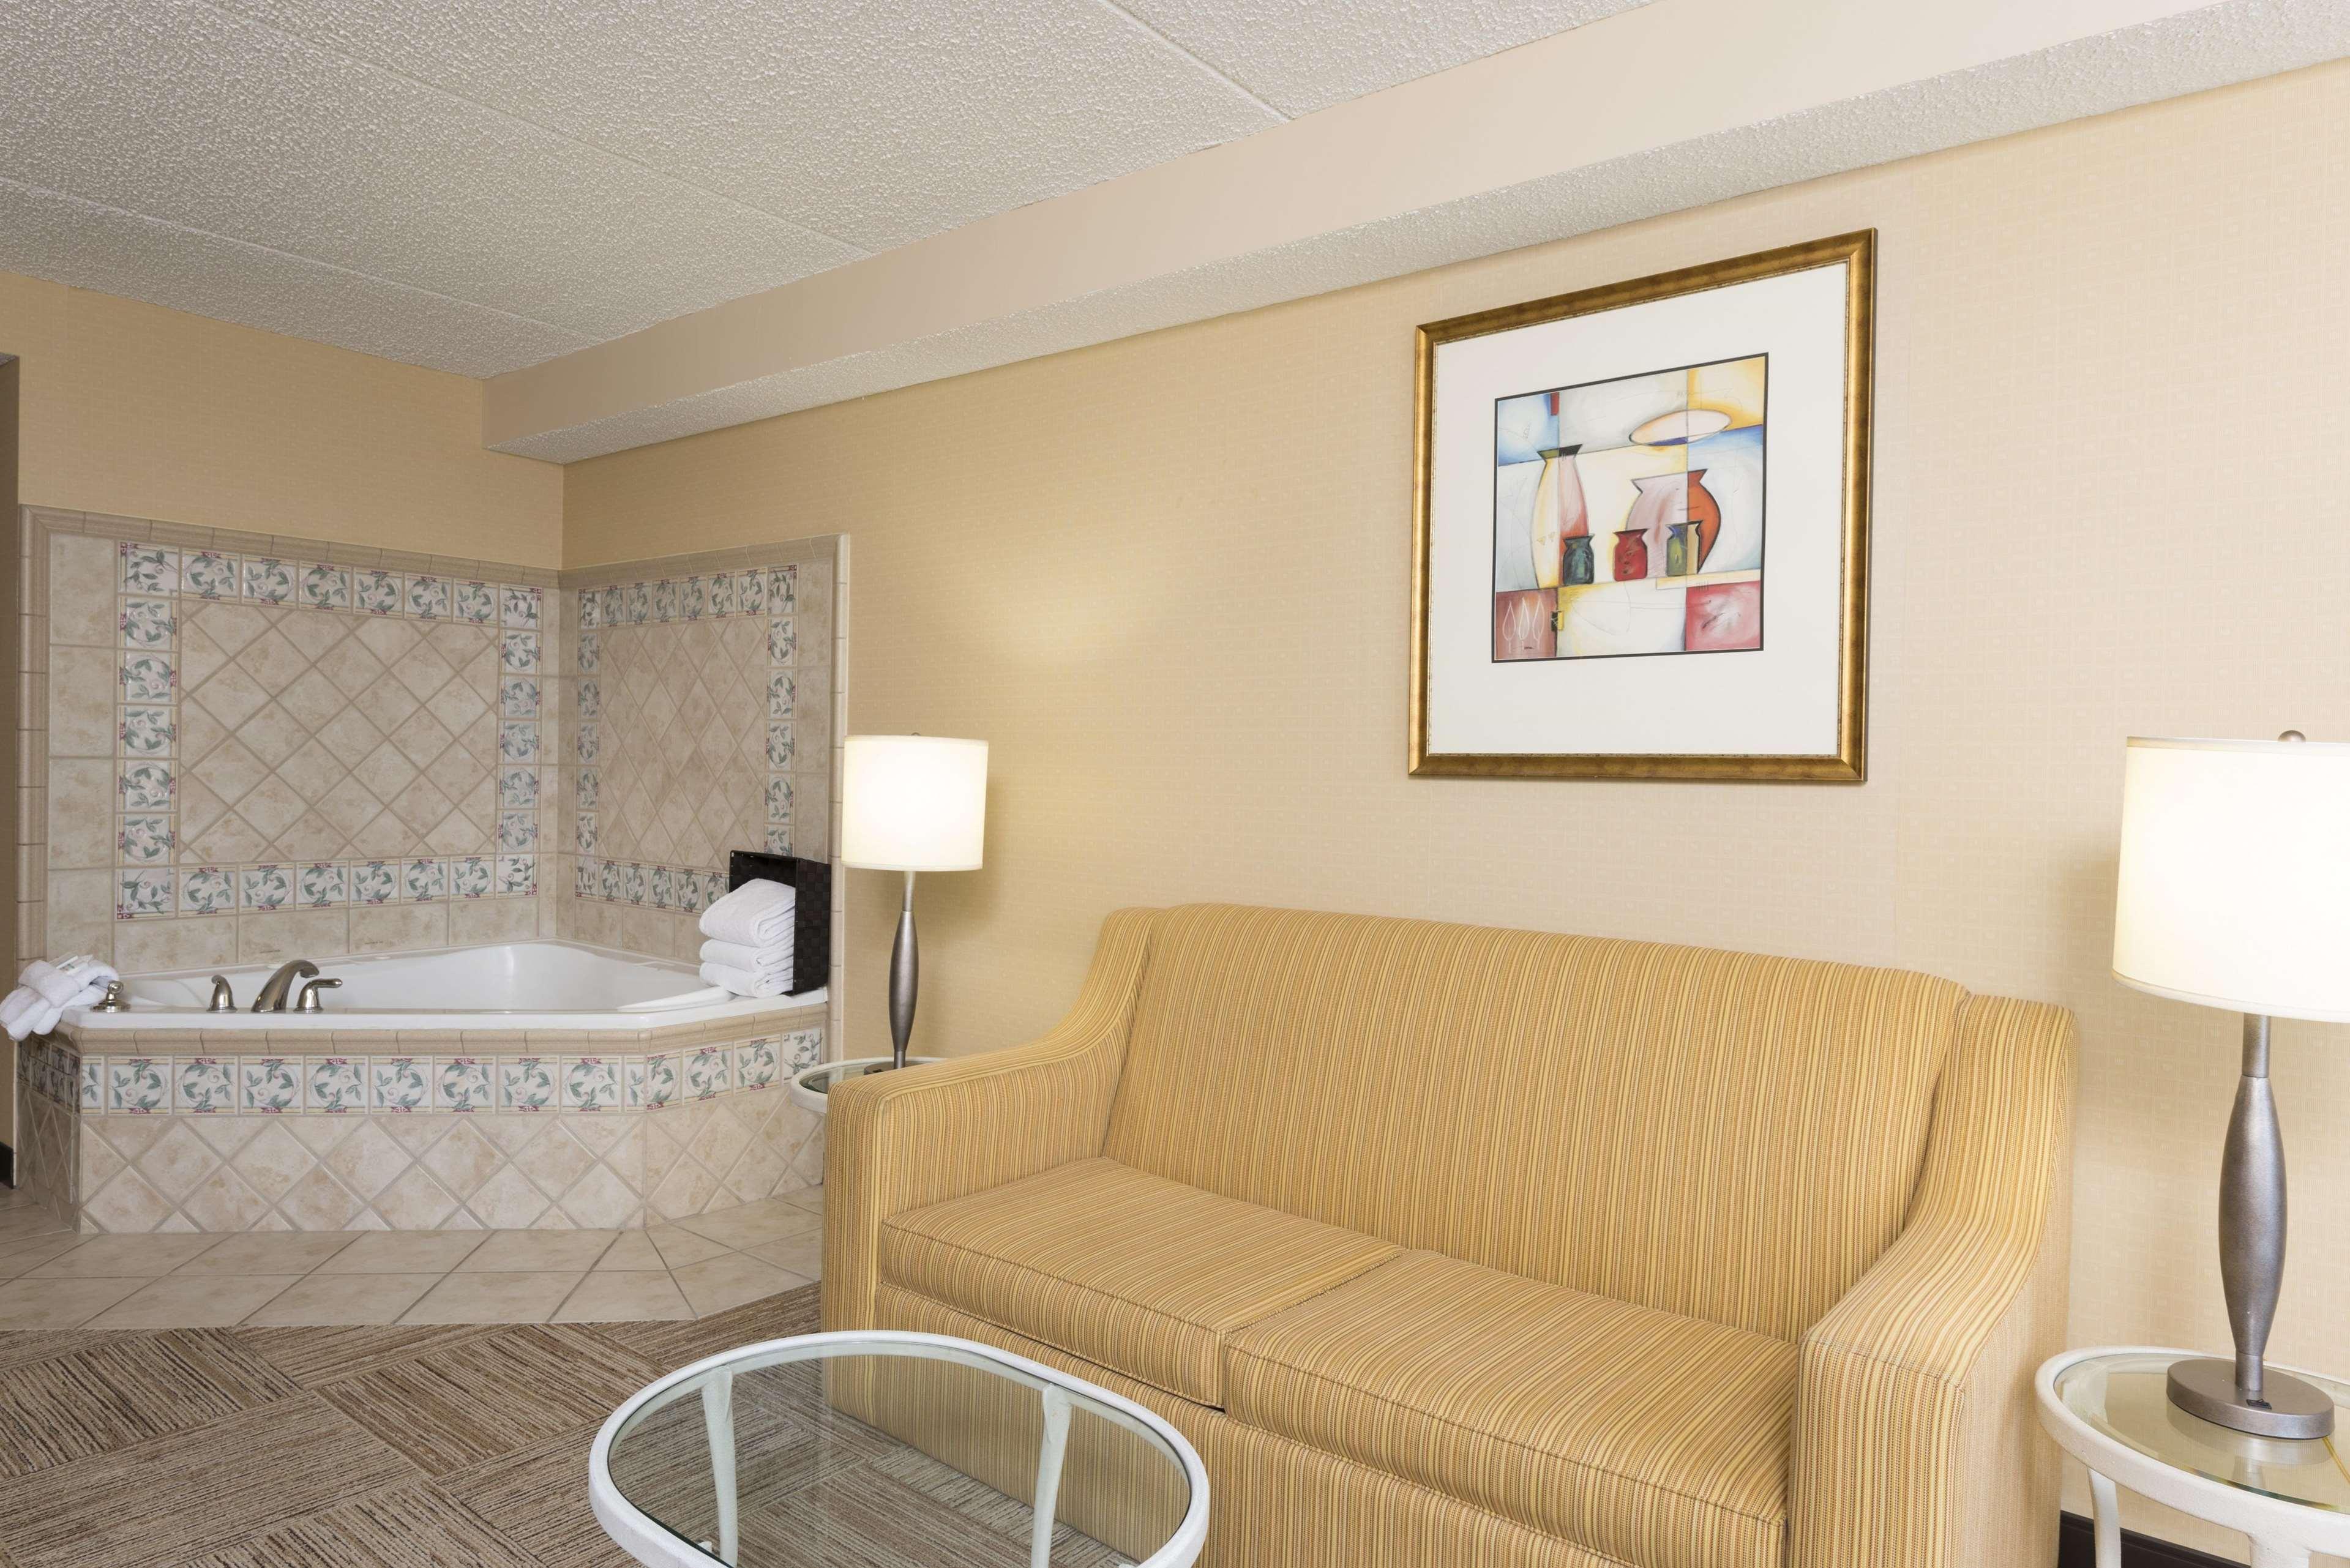 Hilton Garden Inn West Lafayette Wabash Landing image 18